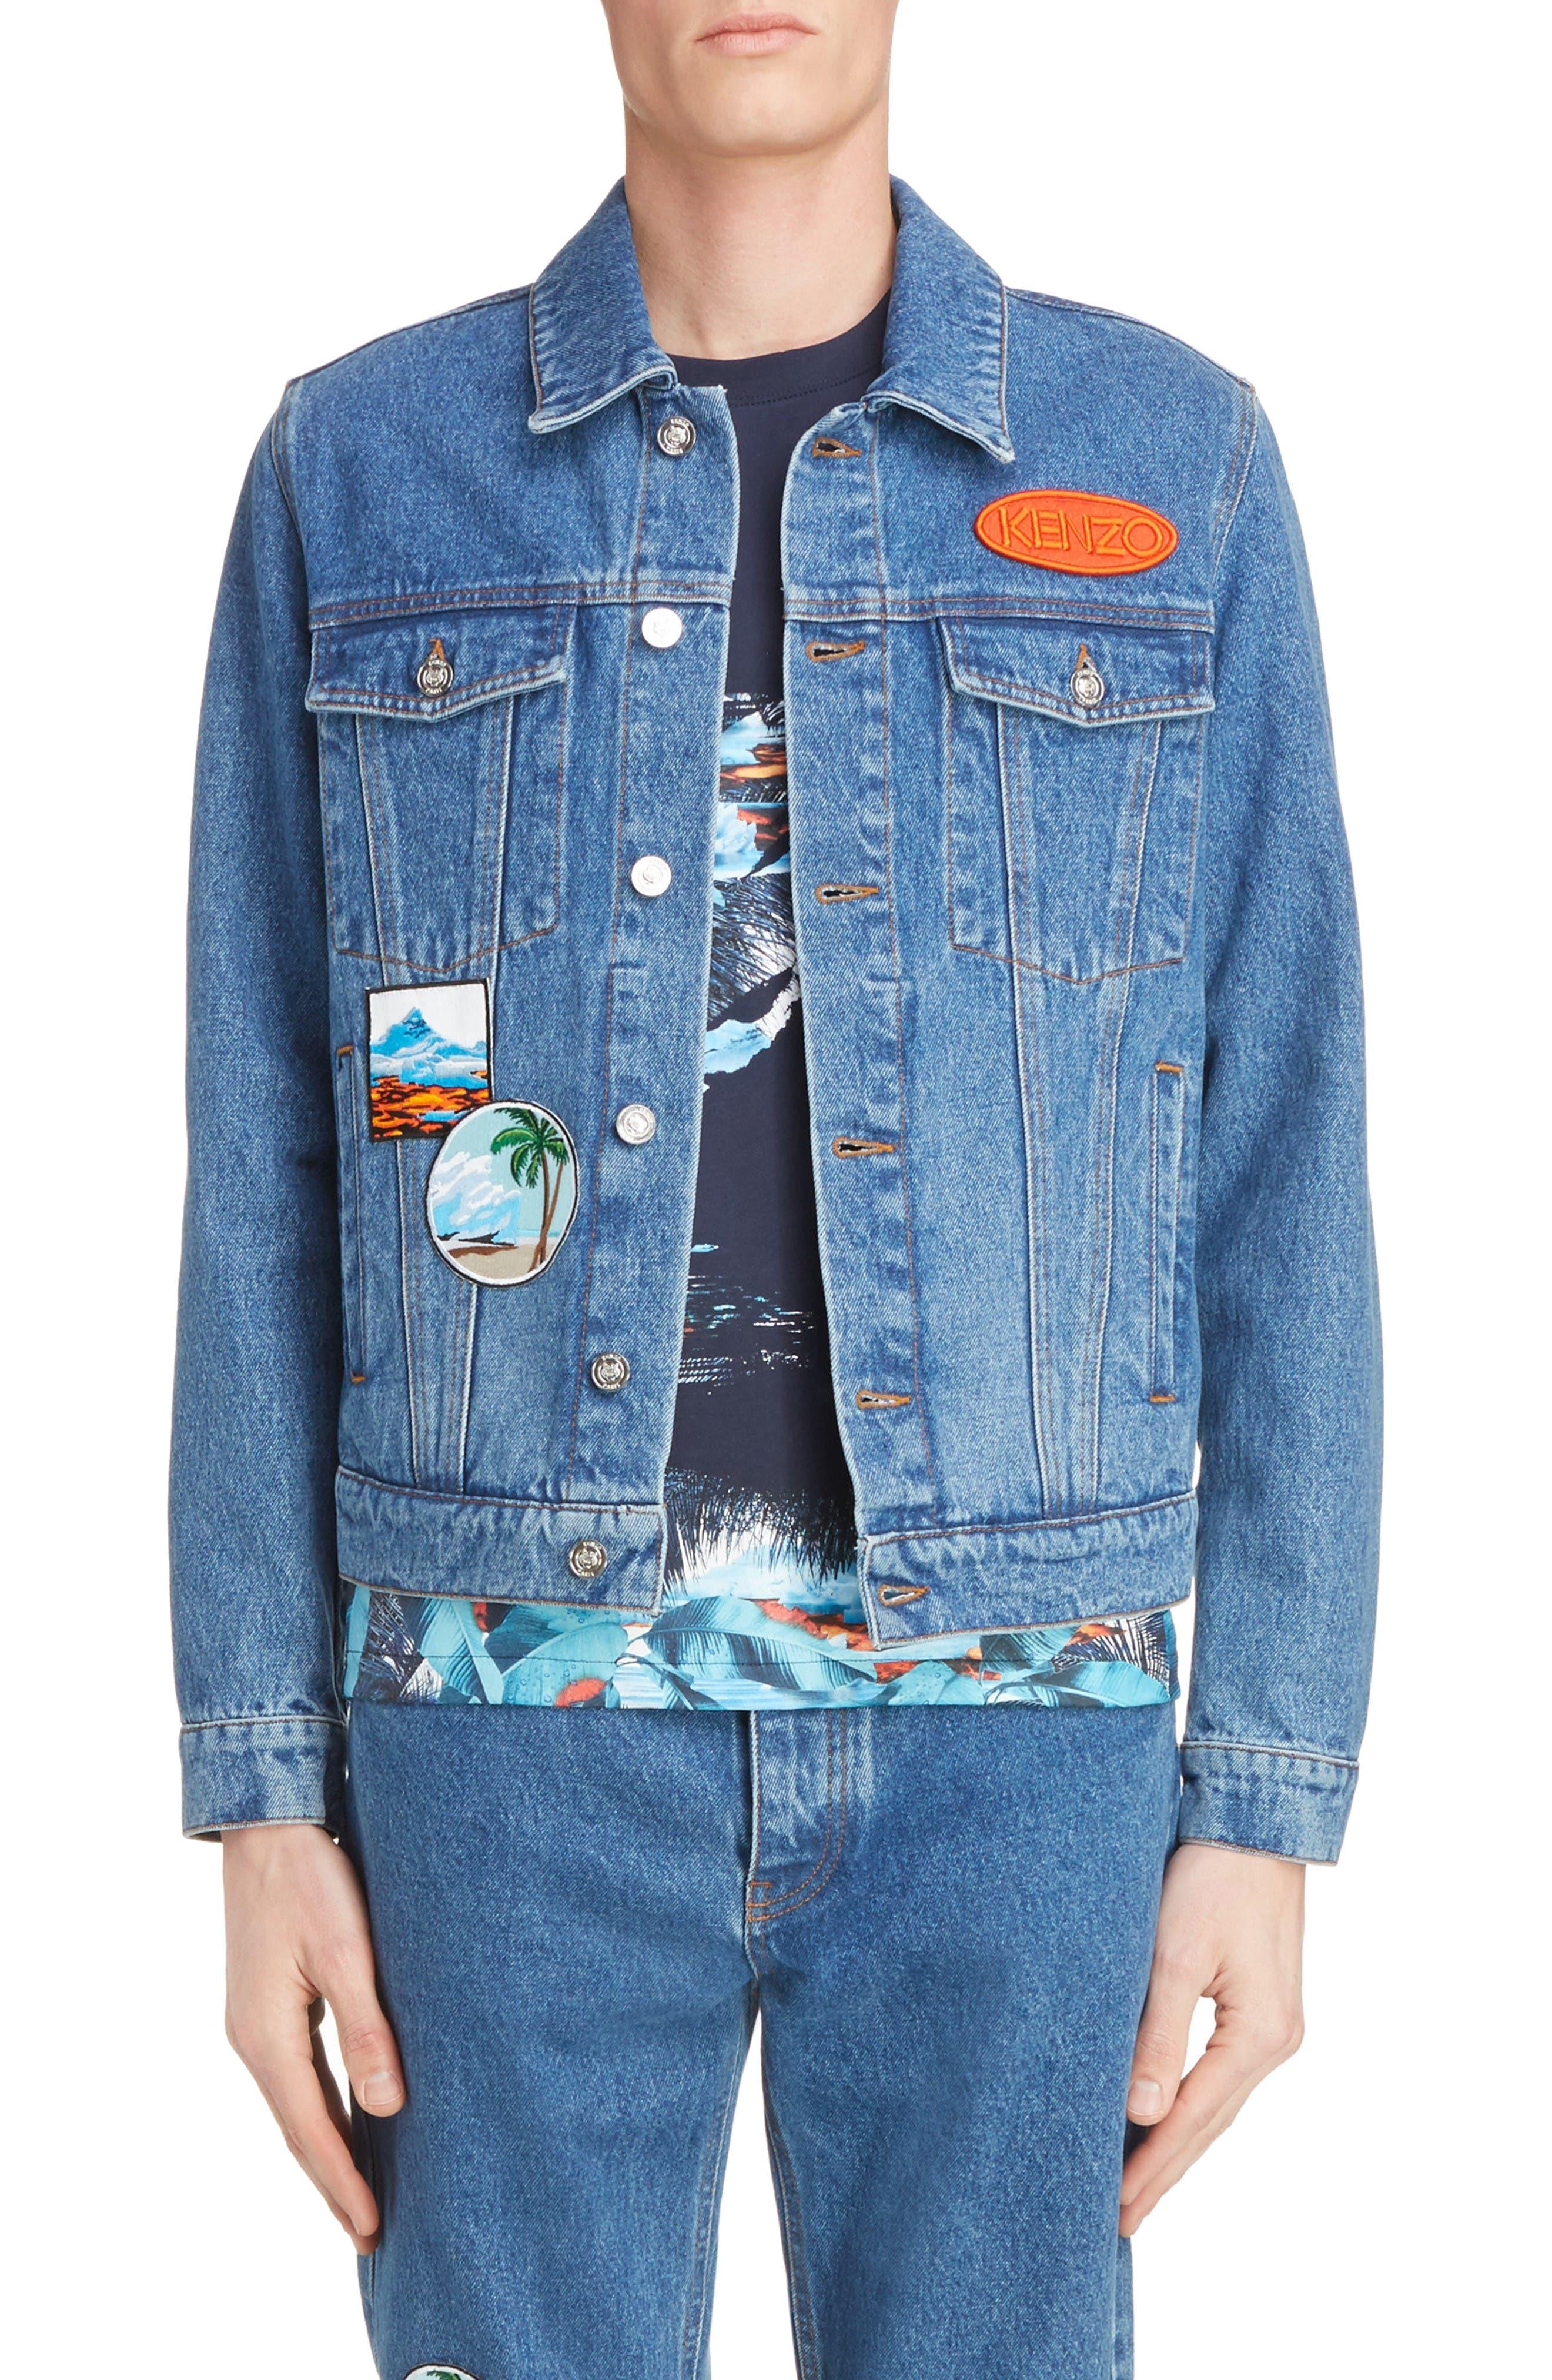 Alternate Image 1 Selected - KENZO Denim Patch Jacket